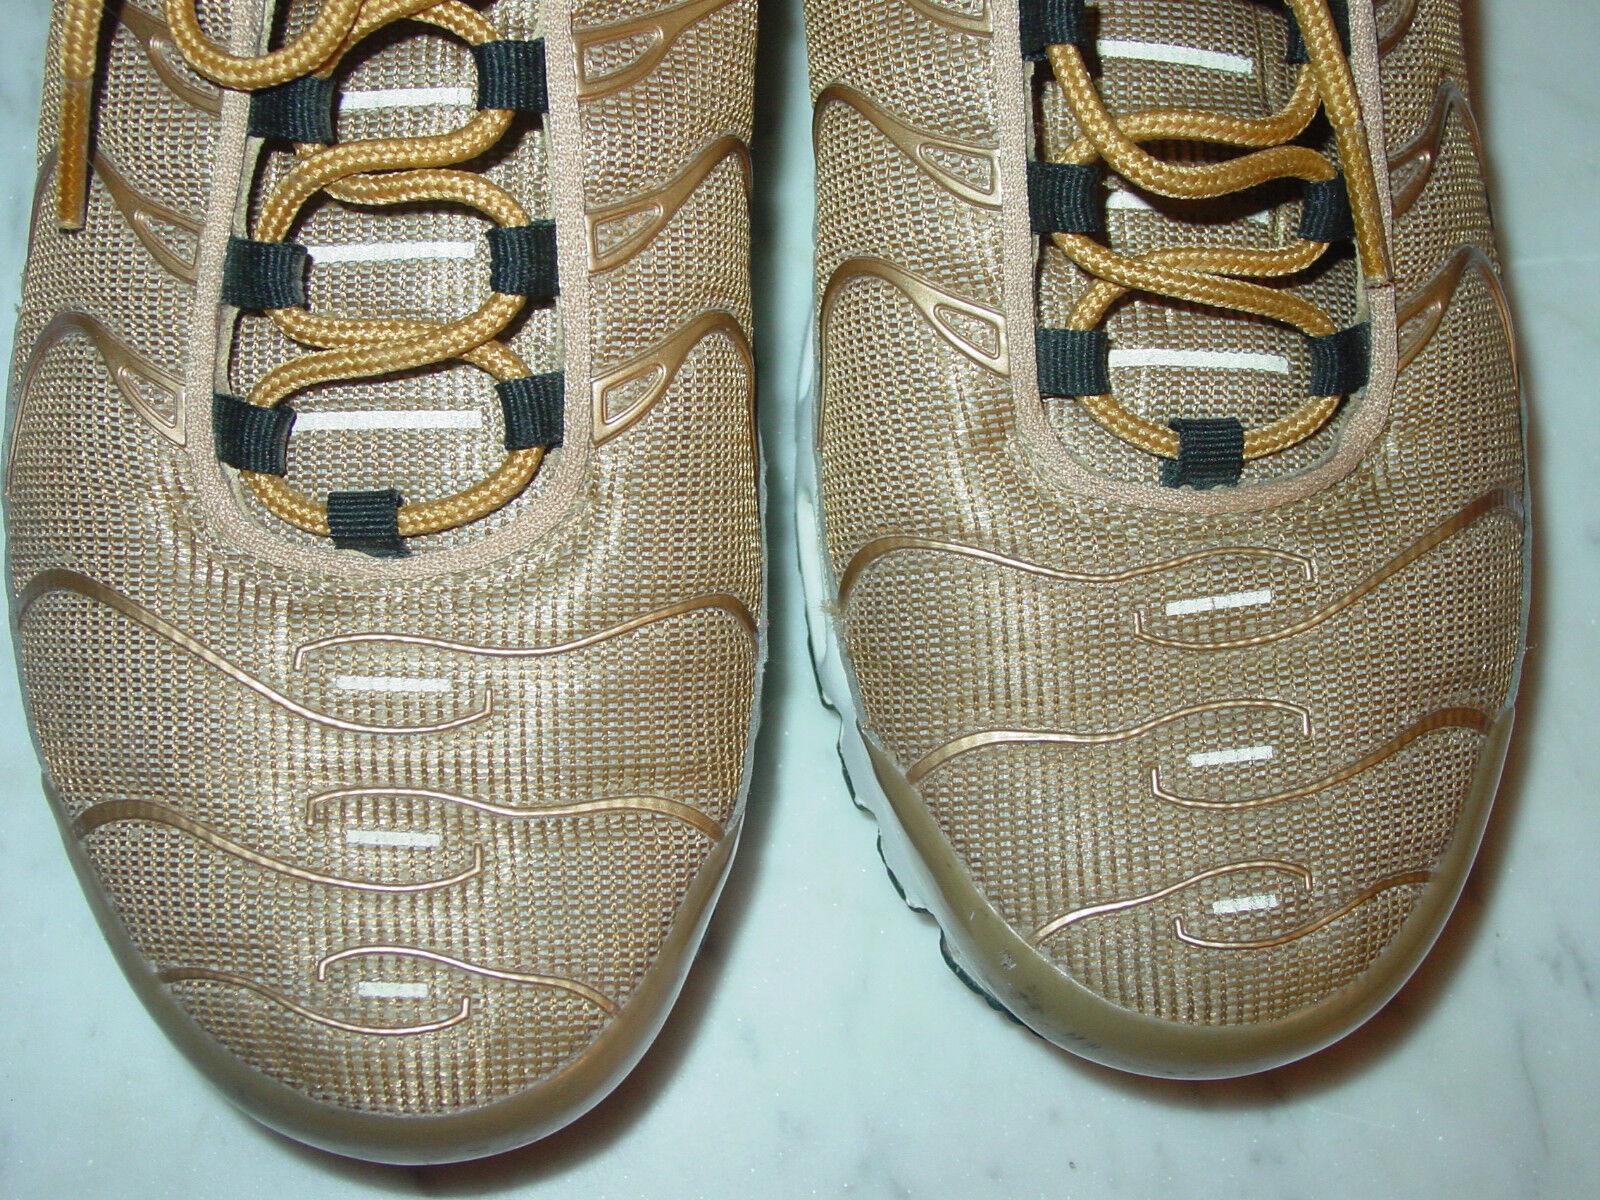 2017 Nike Air Max Plus TN TN TN 1 Tuned Air Metallic gold University Red shoes Size 9.5 0ff005